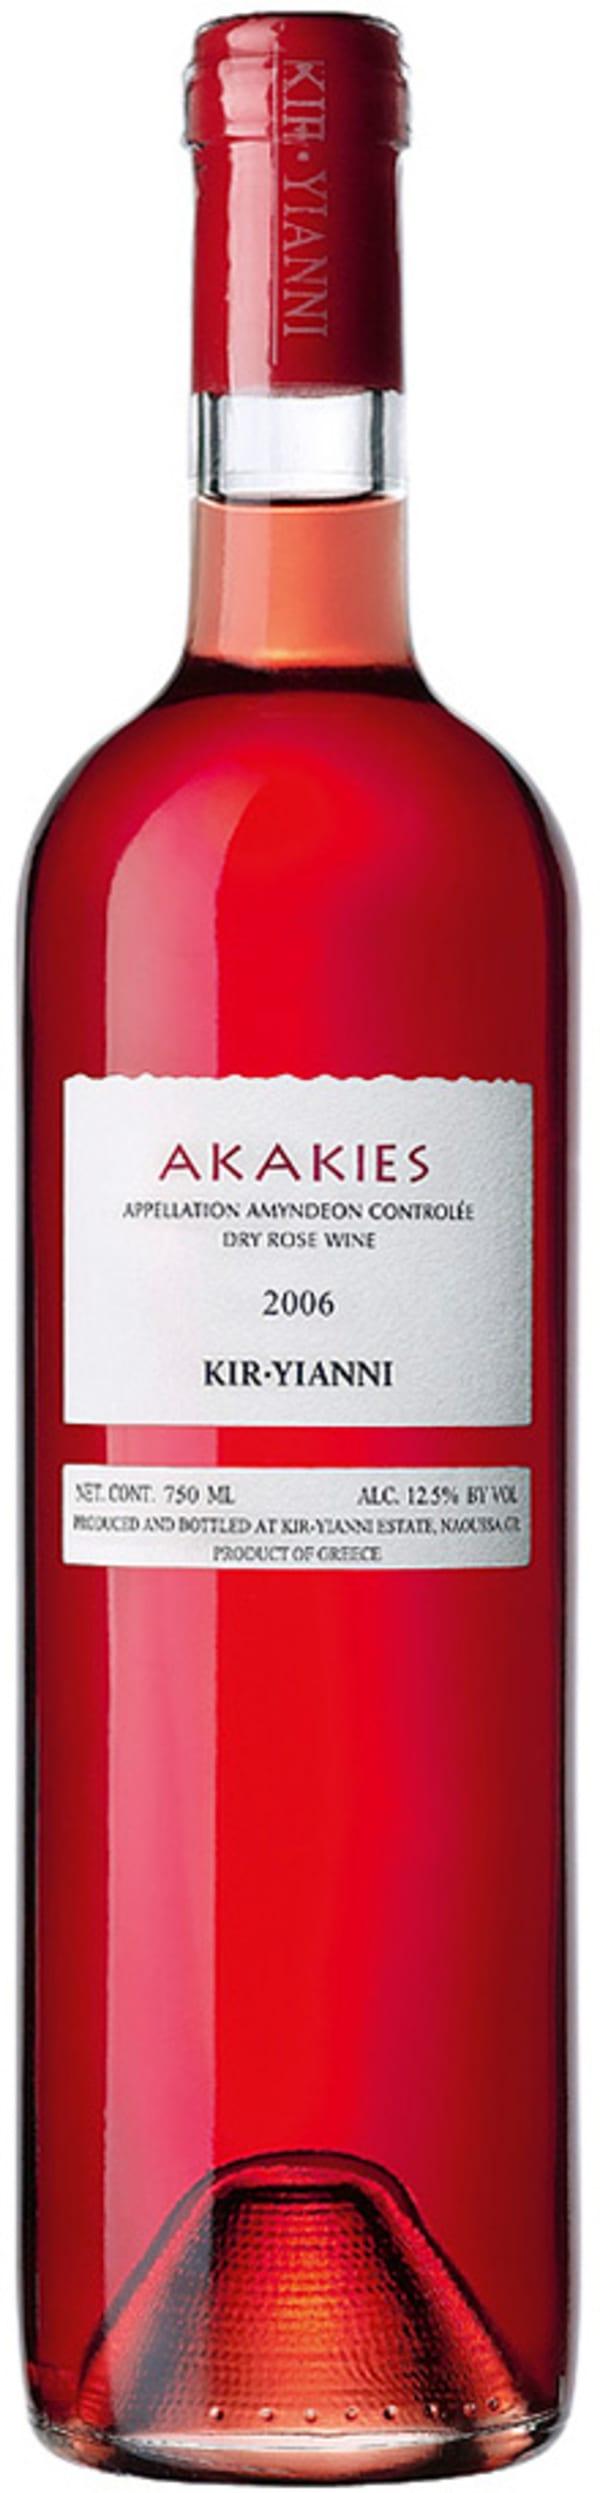 Kir-Yianni Akakies 2018